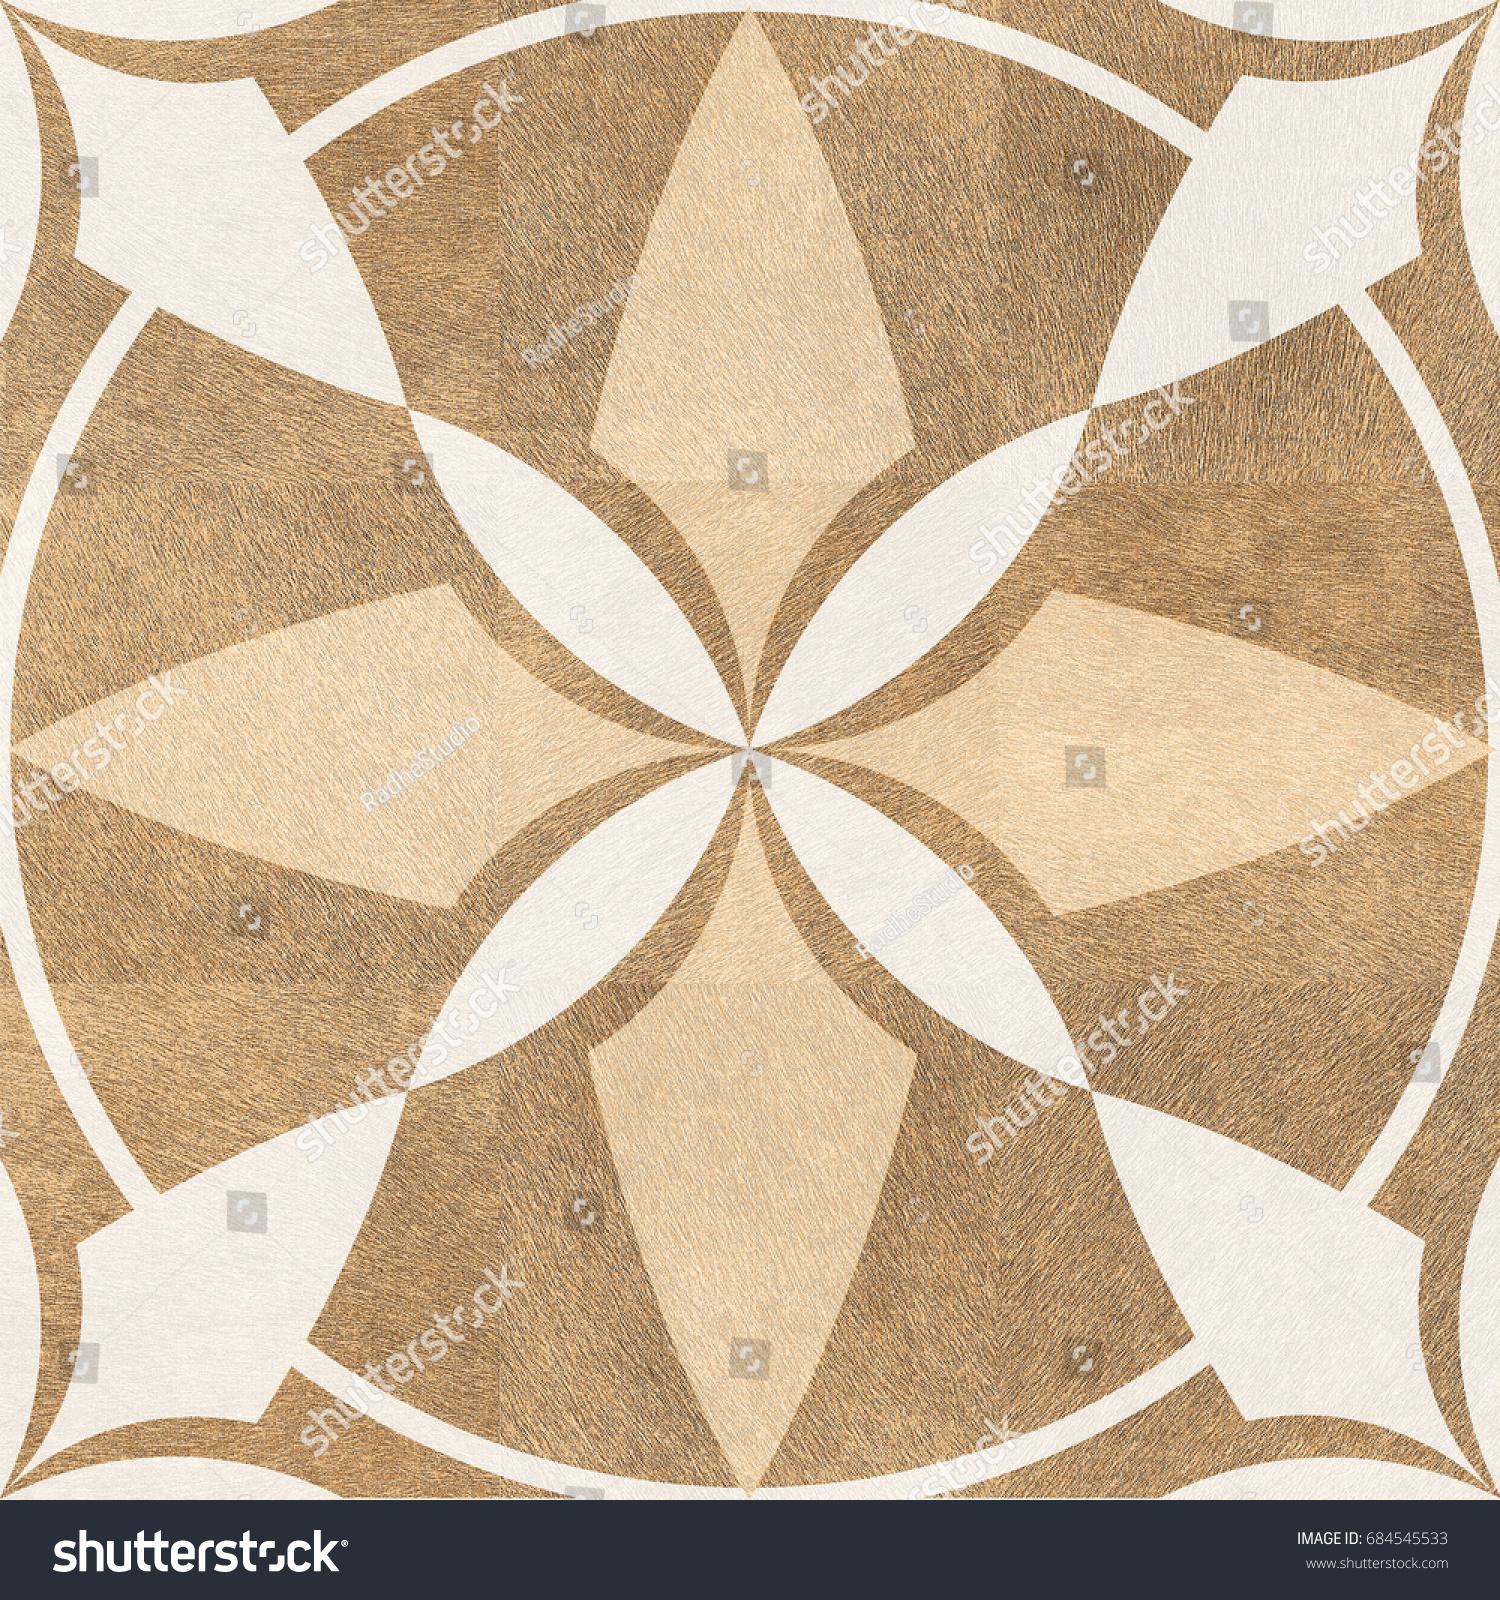 Marble floor tiles pattern porcelain tiles stock illustration marble floor tiles pattern porcelain tiles wall tiles kitchen tiles square pattern dailygadgetfo Choice Image